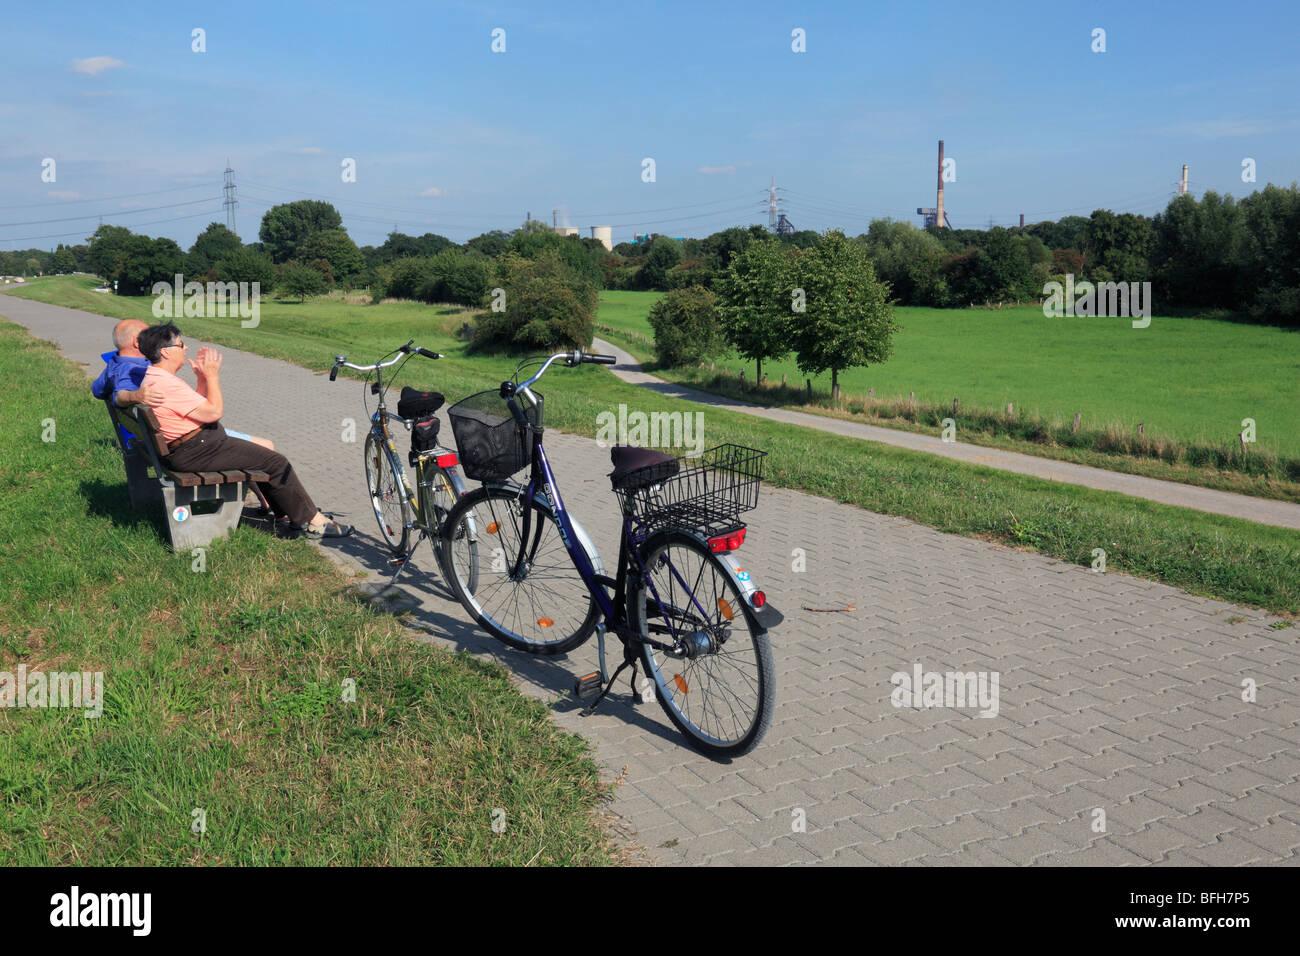 D-Duisburg, Rhine, Lower Rhine, Ruhr area, North Rhine-Westphalia, D-Duisburg-Rheinhausen, D-Duisburg-Rheinhausen - Stock Image